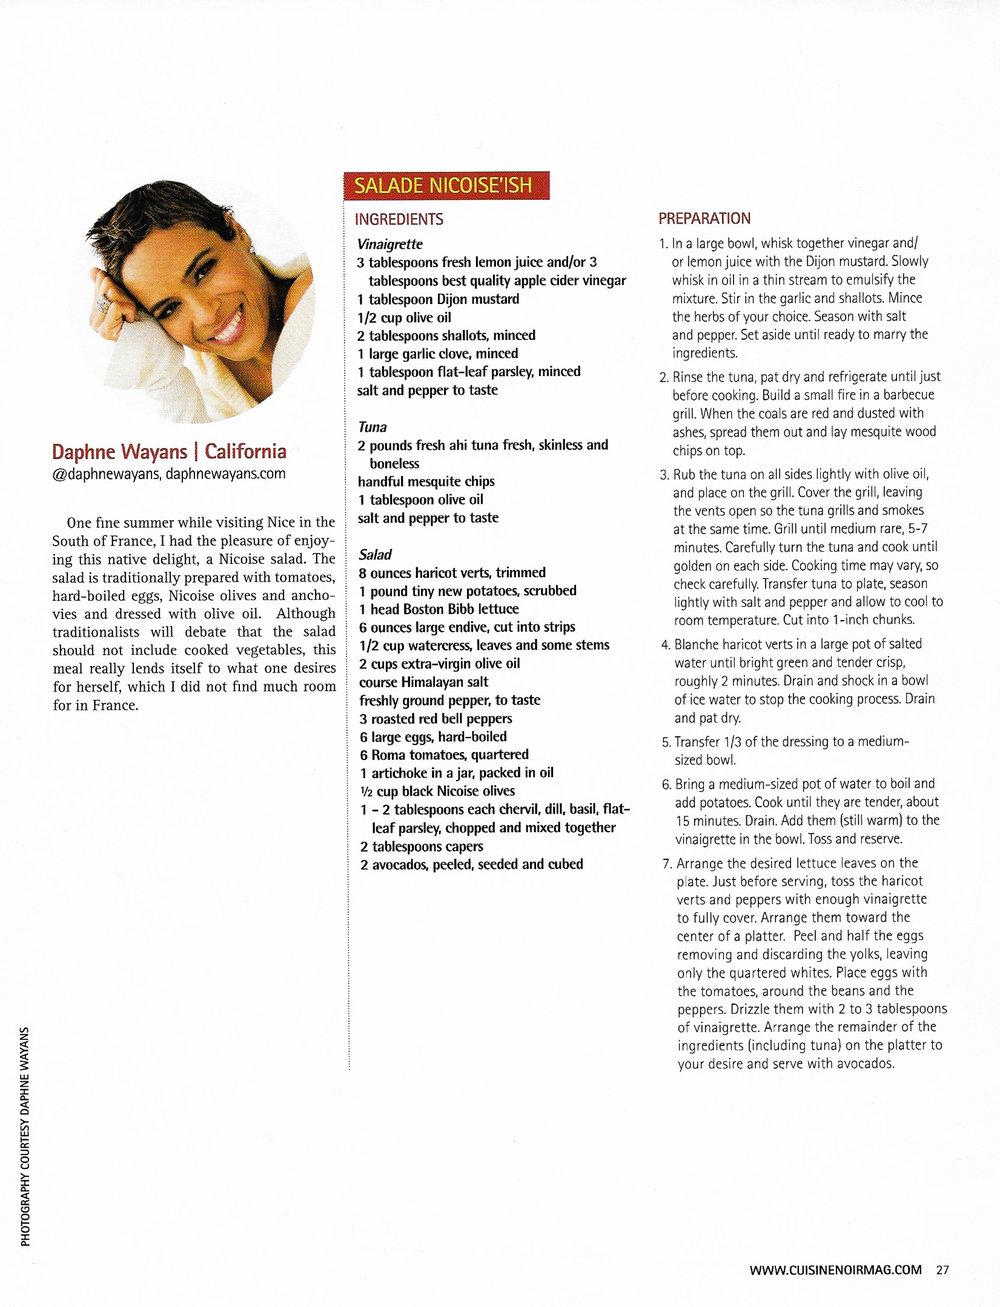 Daphne Wayans in Cuisine Noir